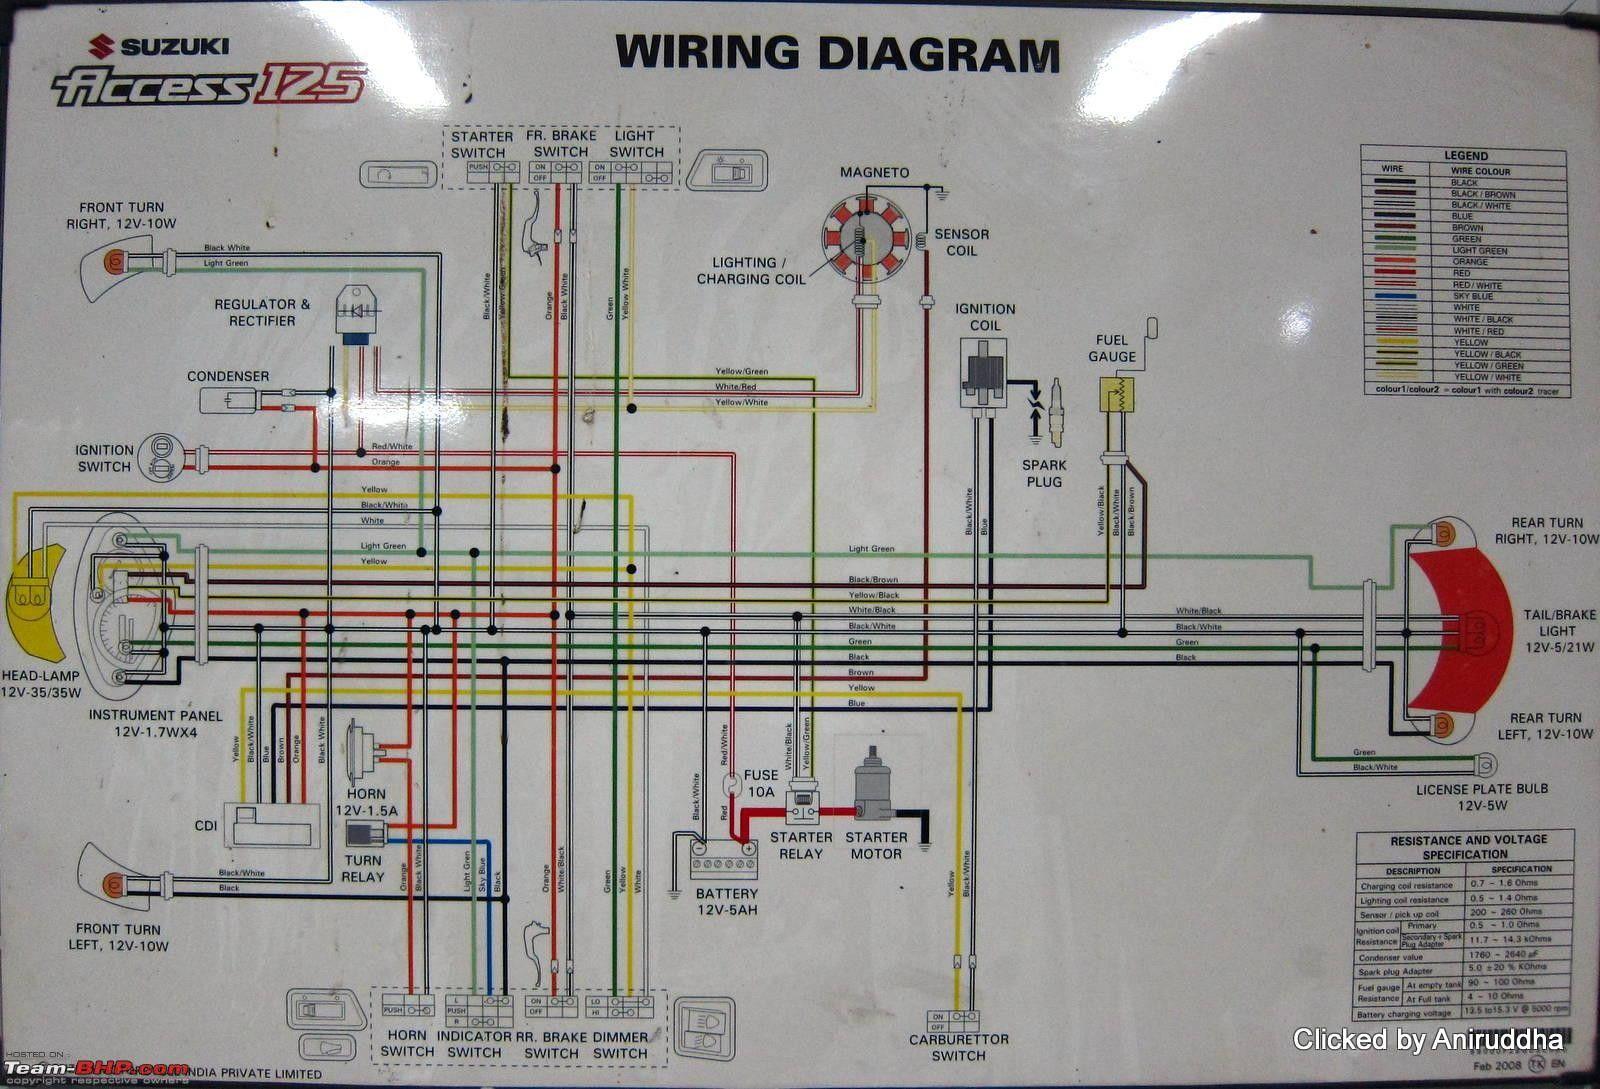 Suzuki Access 125 Wiring Diagram With Images